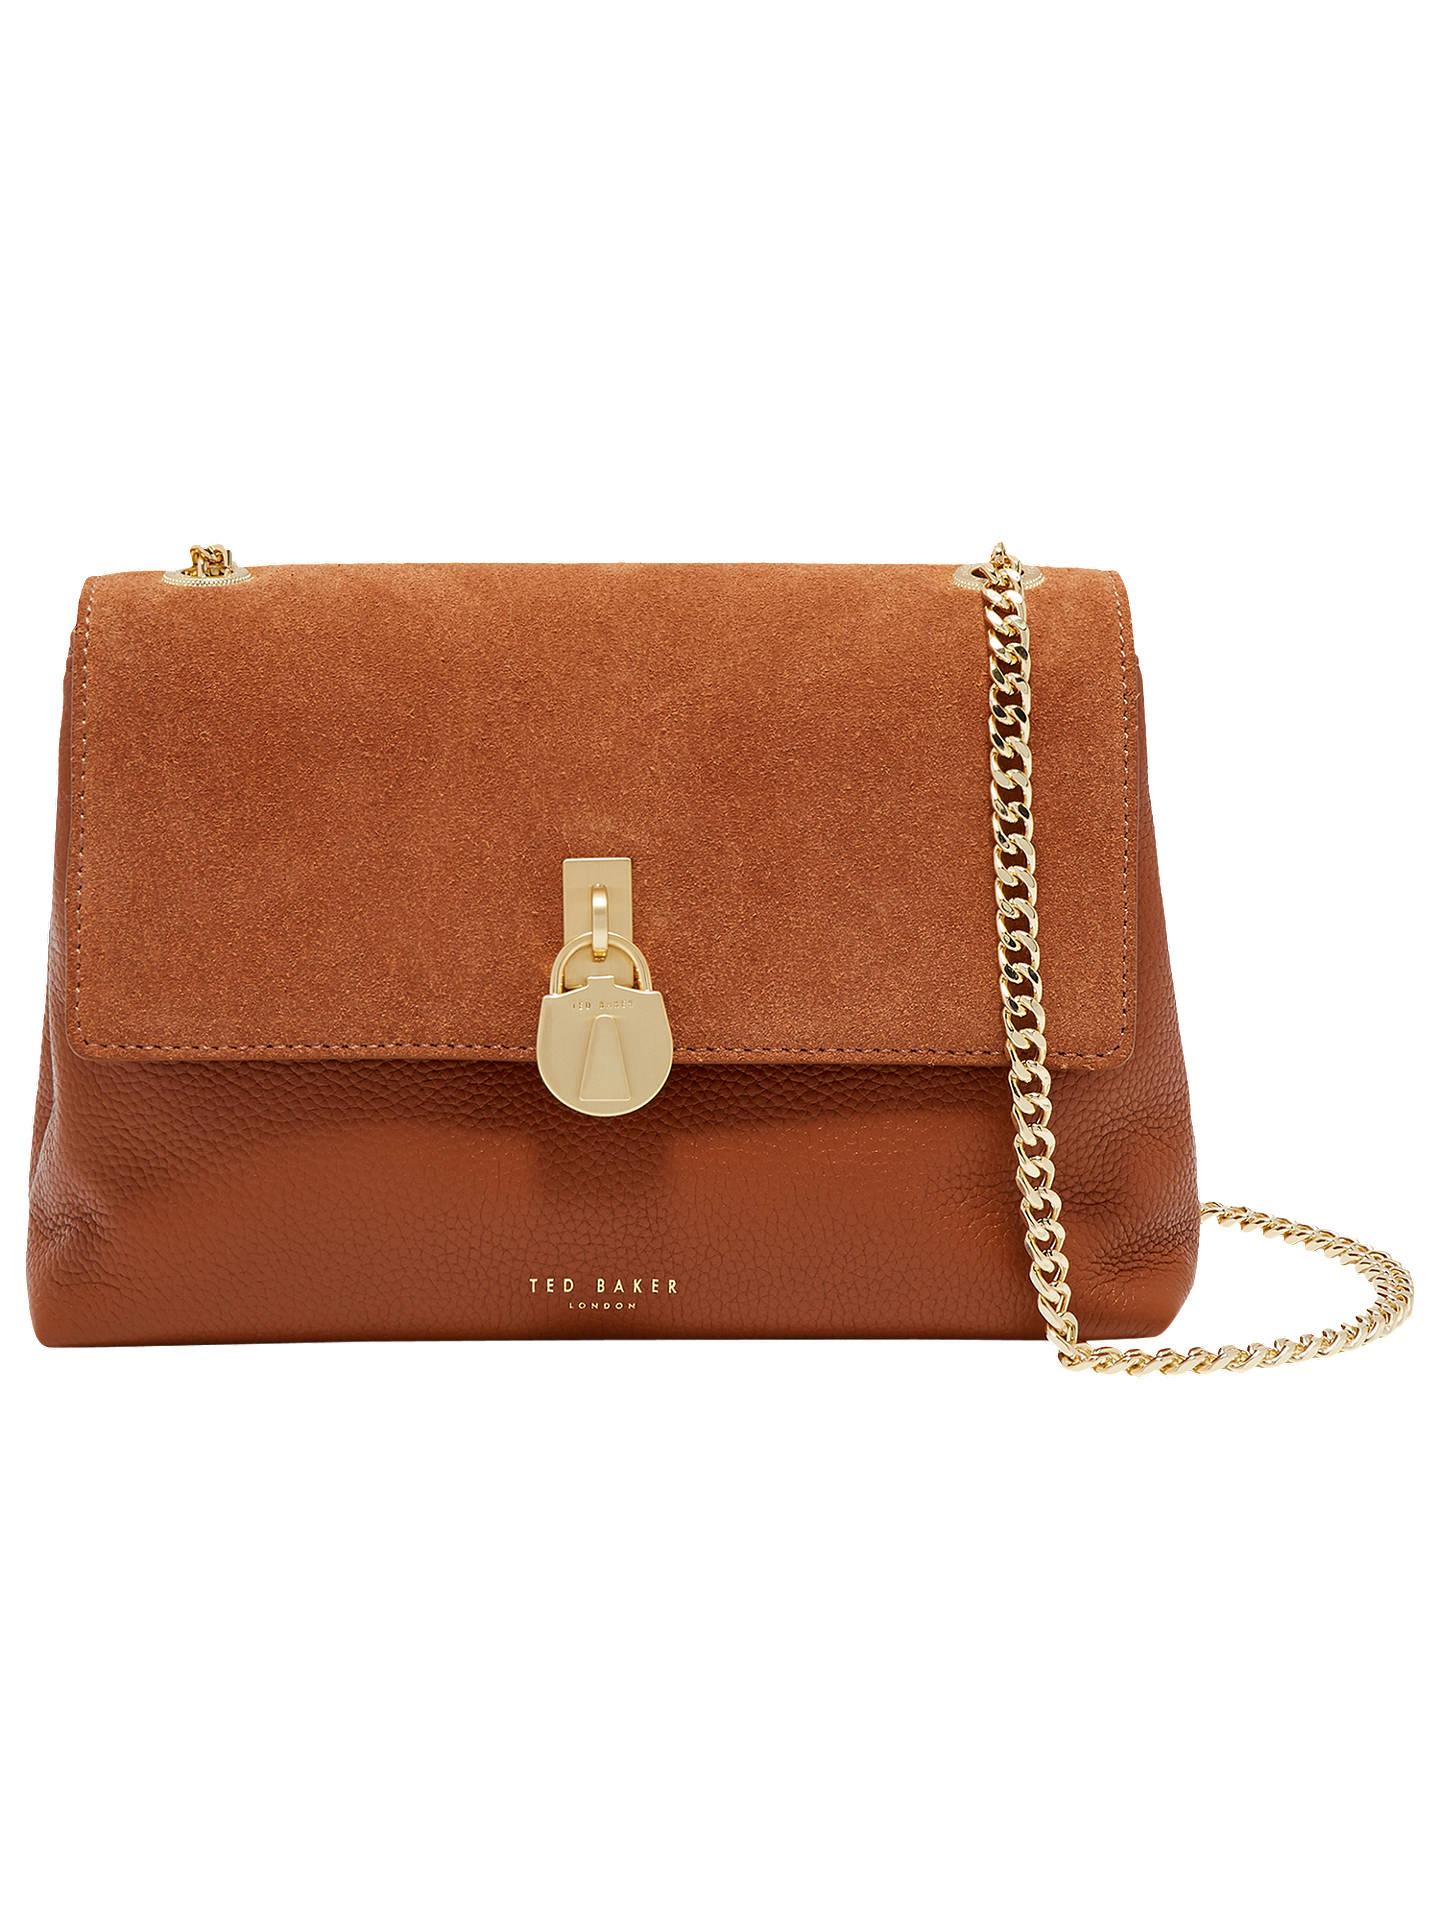 1a5e778e9a06 Ted Baker Helena Padlock Detail Leather Cross Body Bag at John Lewis ...